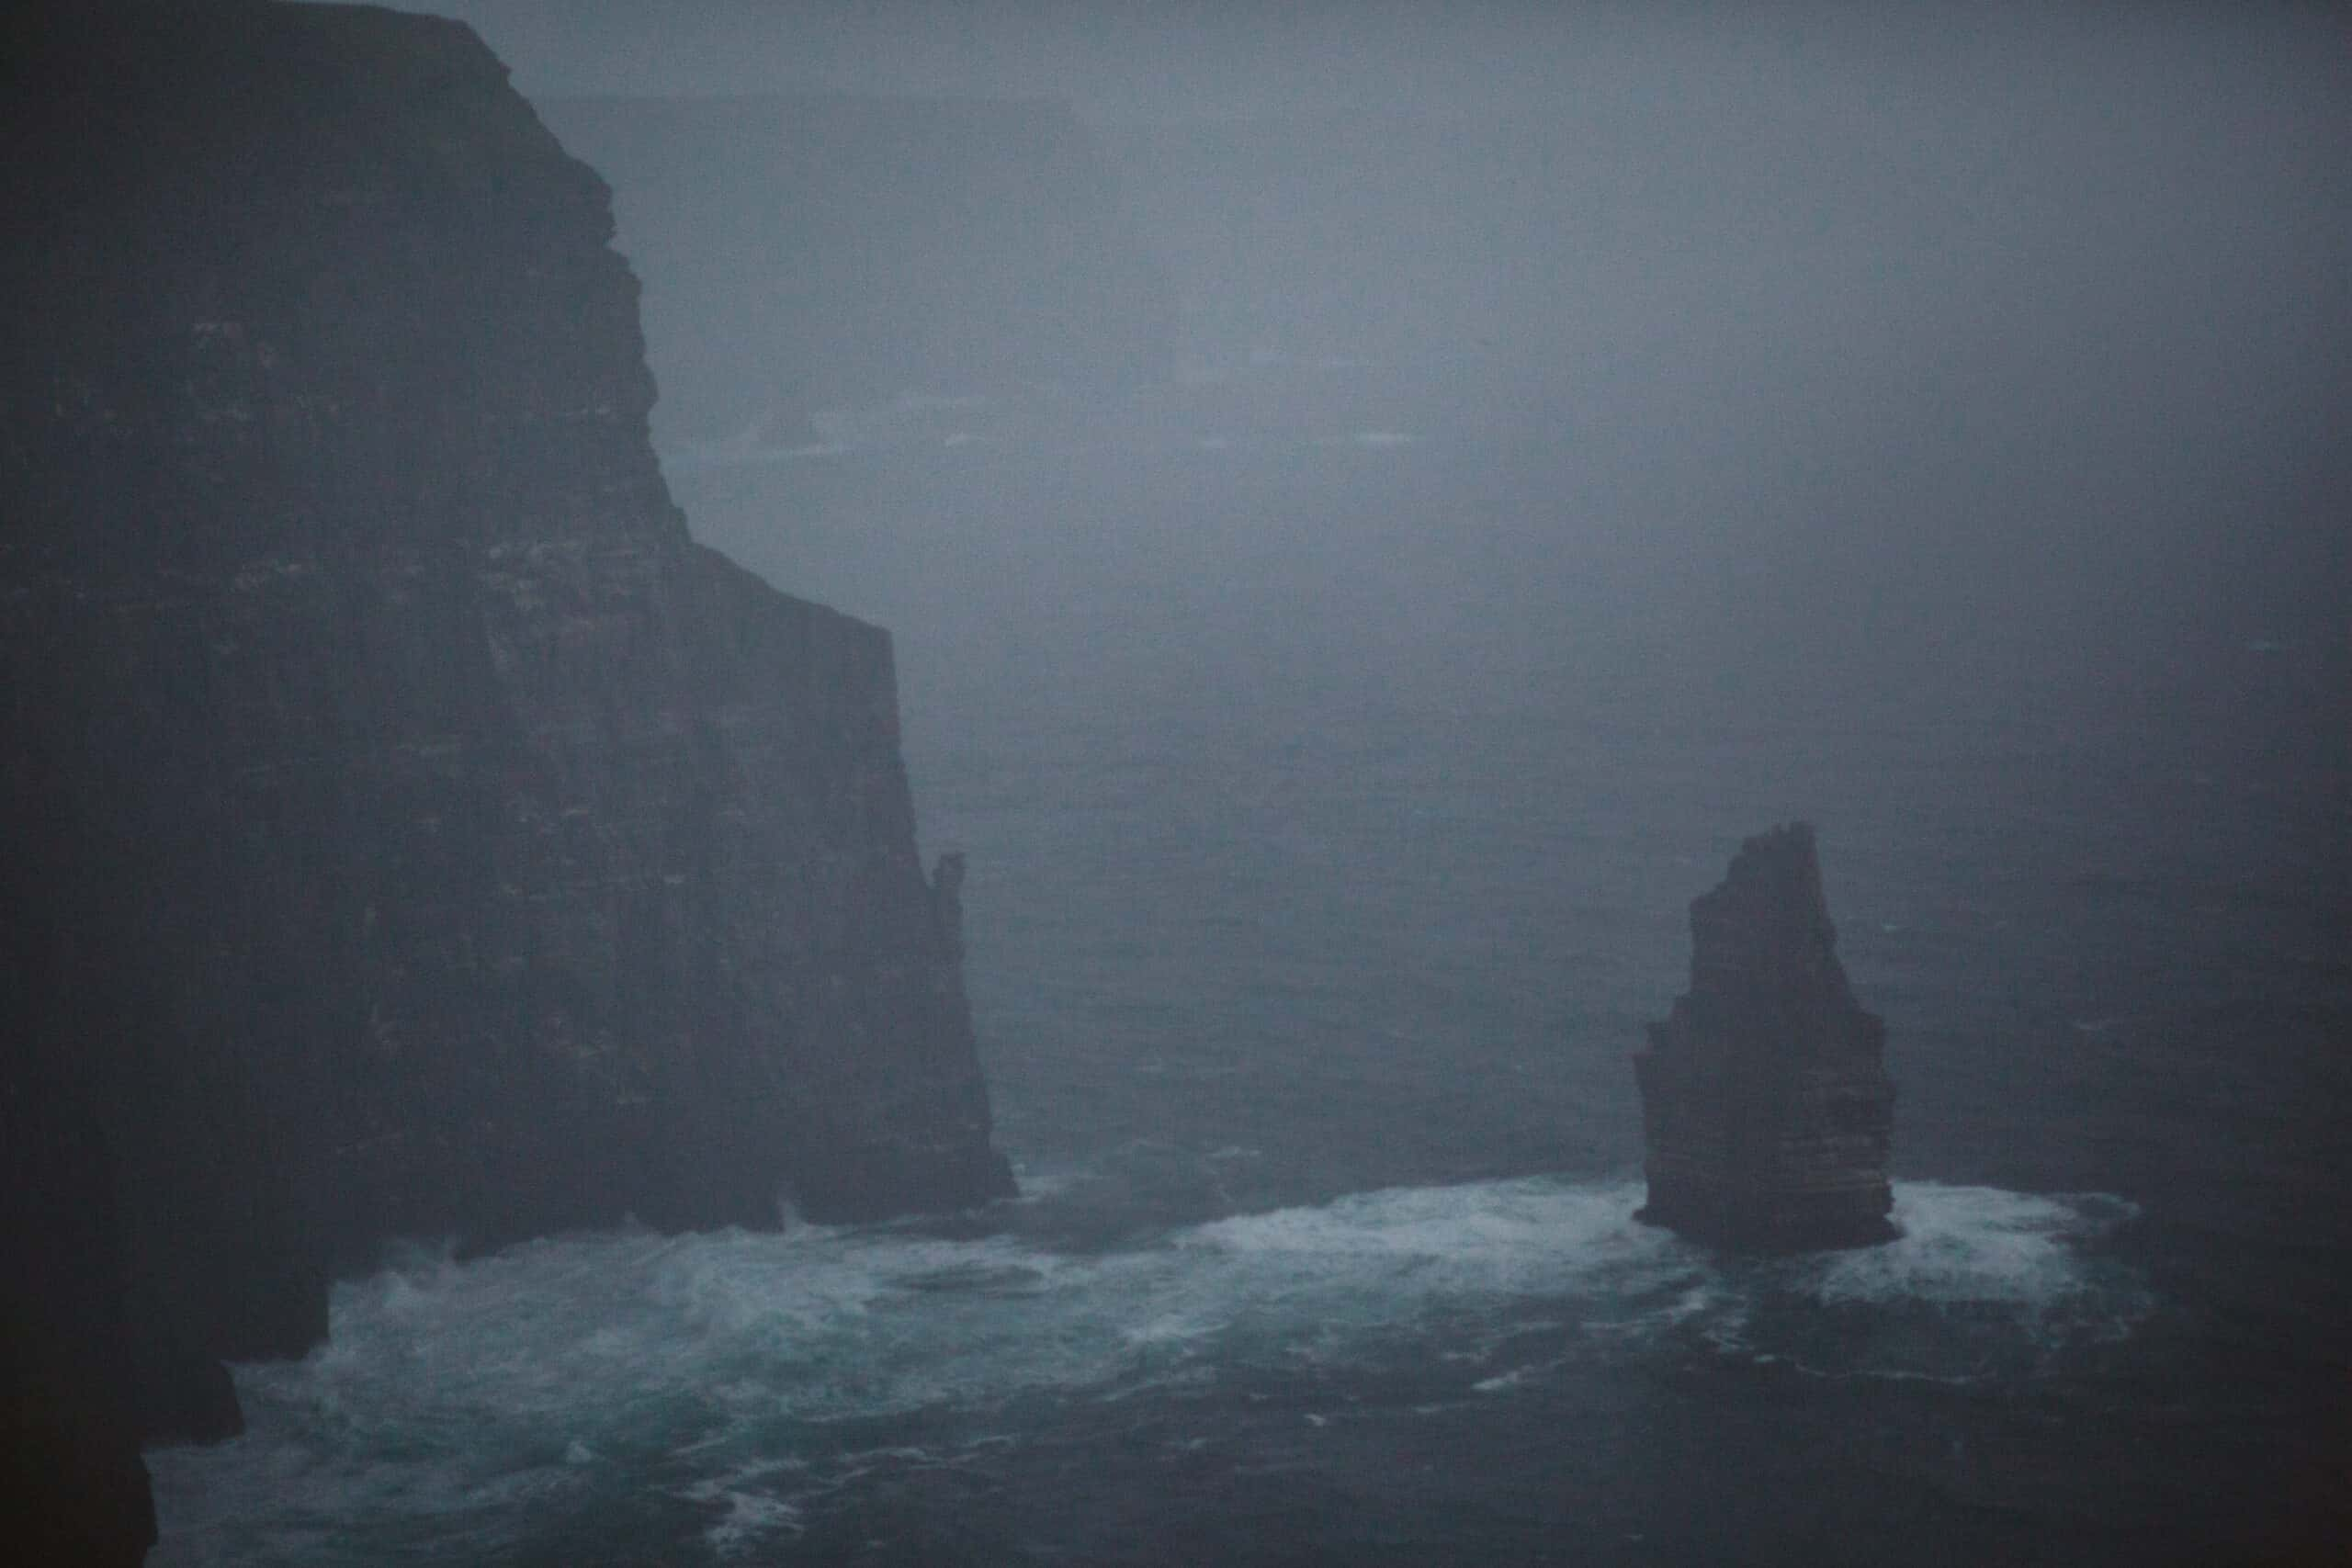 Cliffs of Moher Wedding Hags head, misty shot of the cliffs